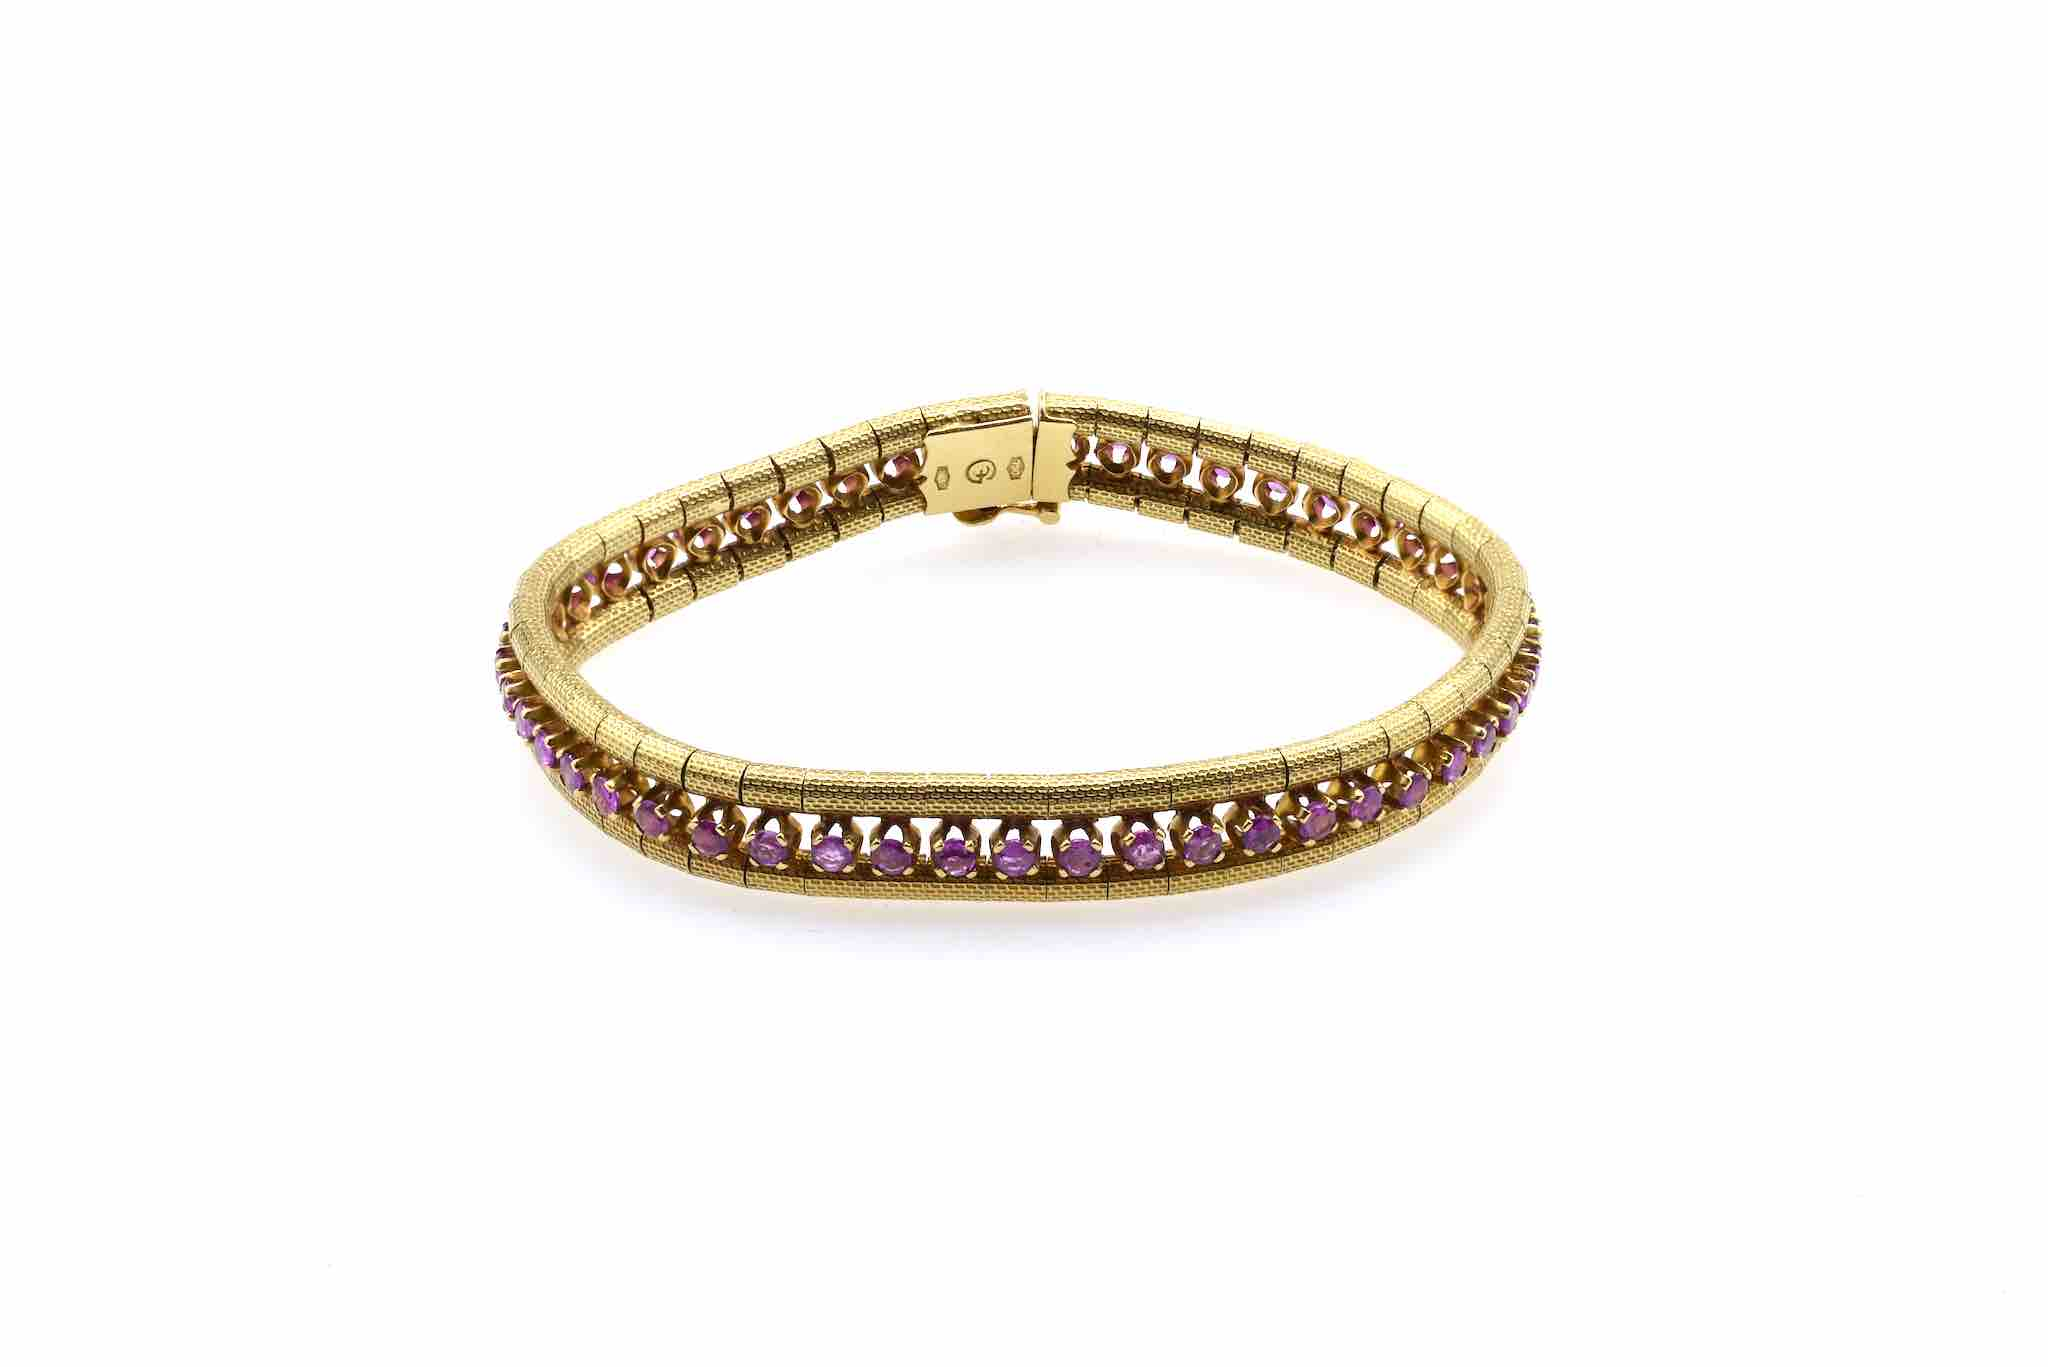 bracelet ancien rubis en or jaune 18k